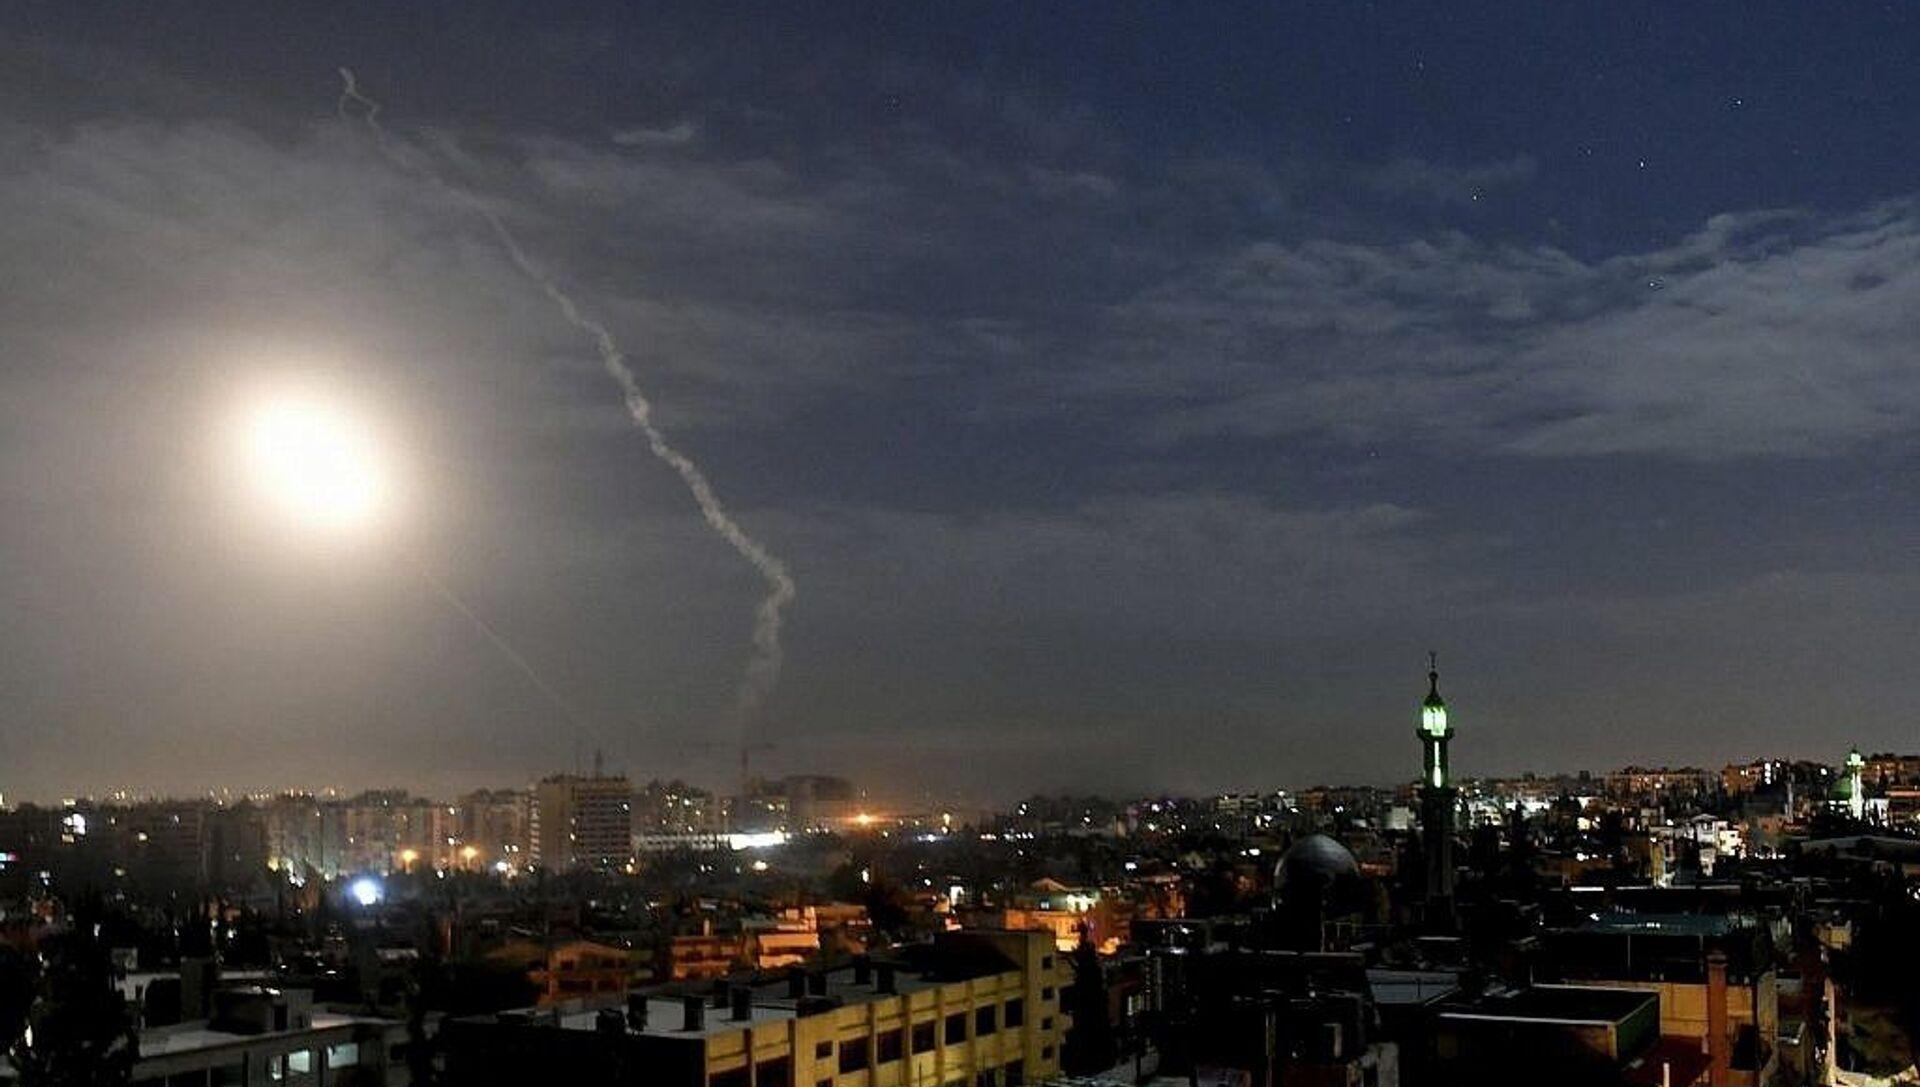 Siria missili da Israele - Sputnik Italia, 1920, 04.02.2021